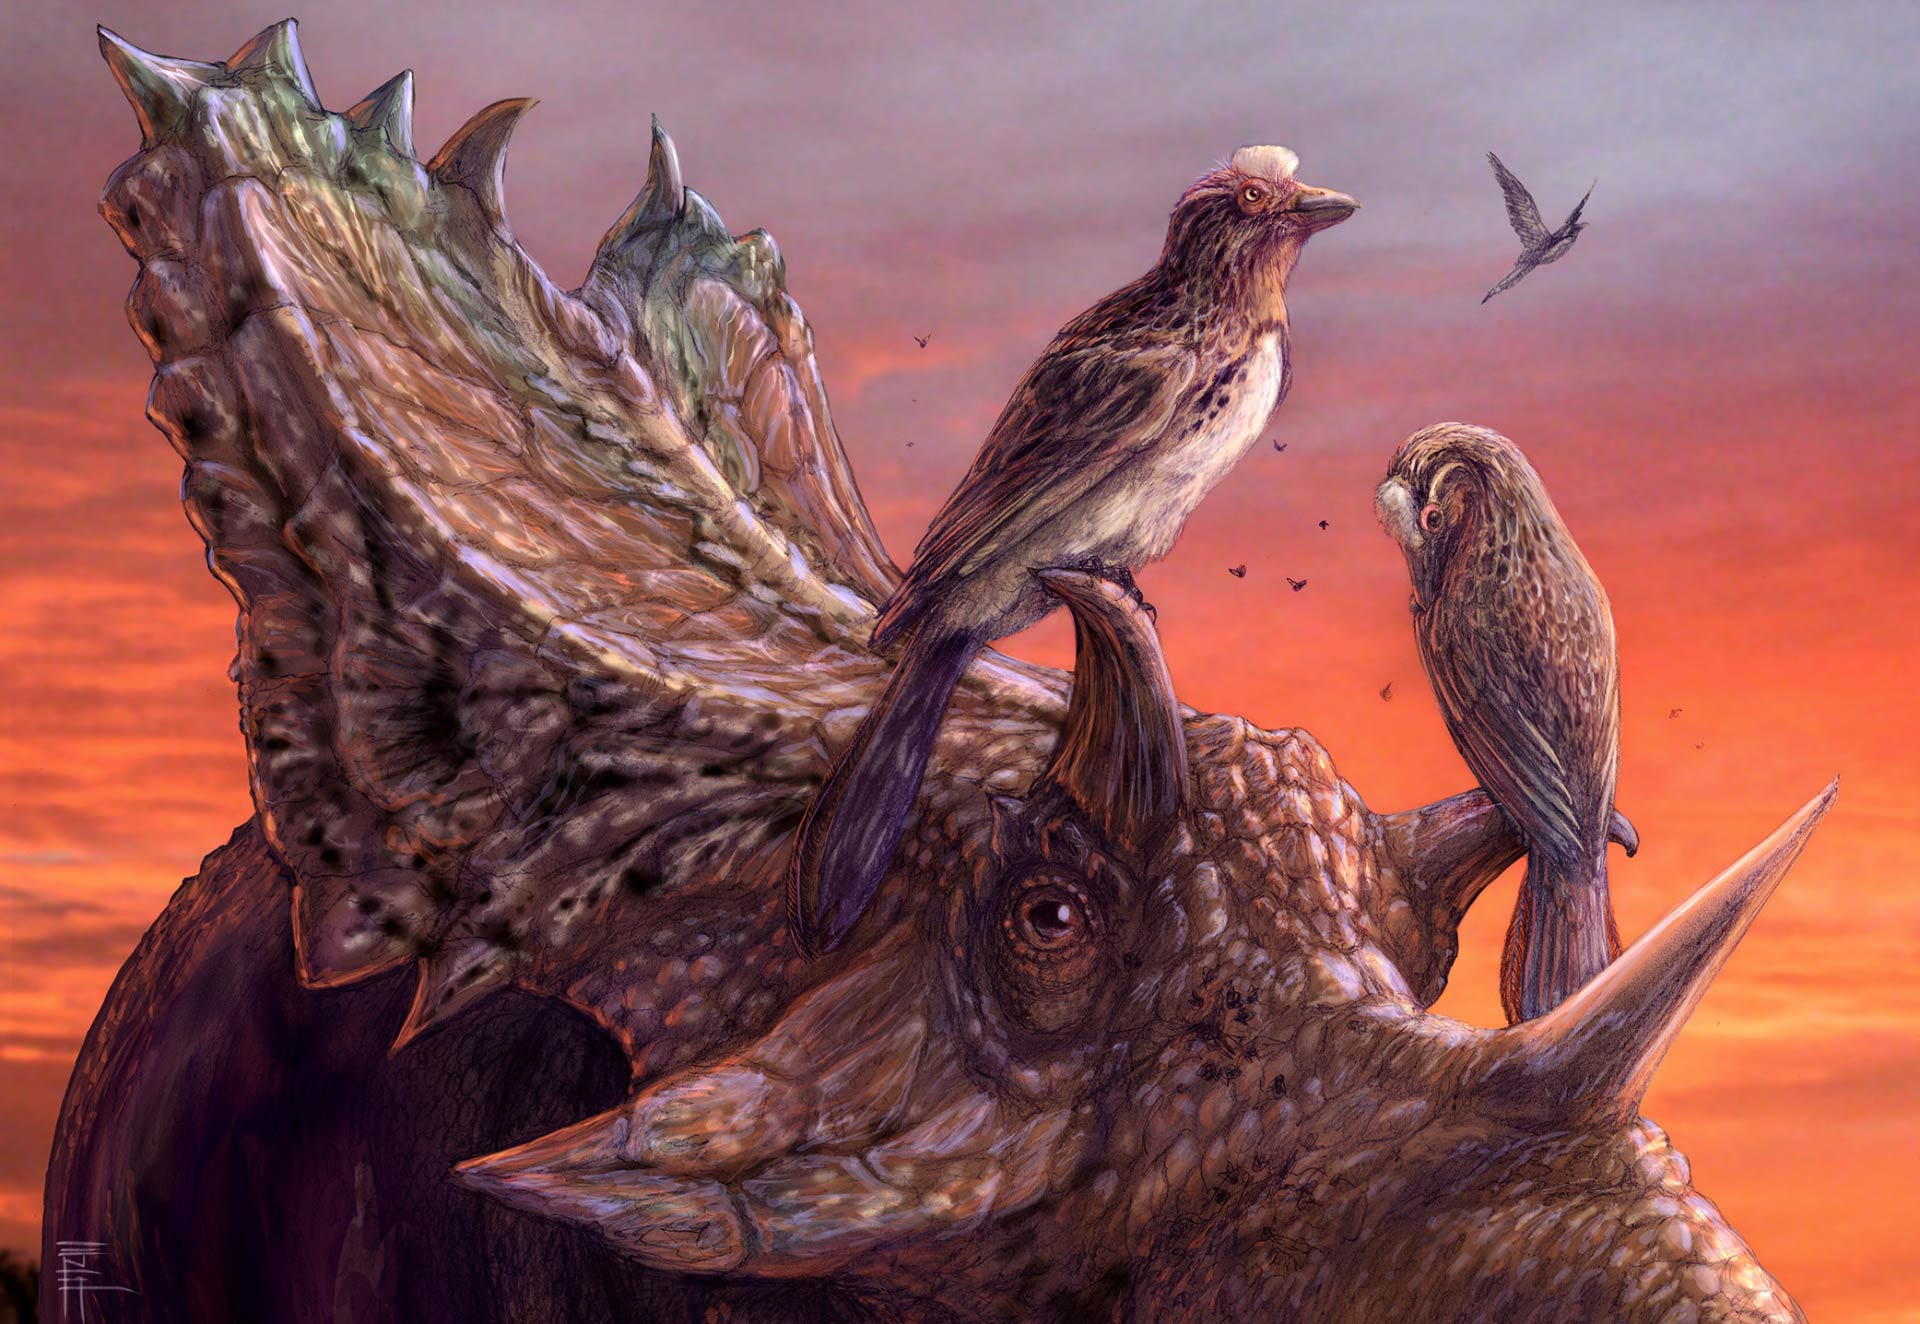 mirarce_eatoni_utahceratops_gettyi_brian_engh.jpg